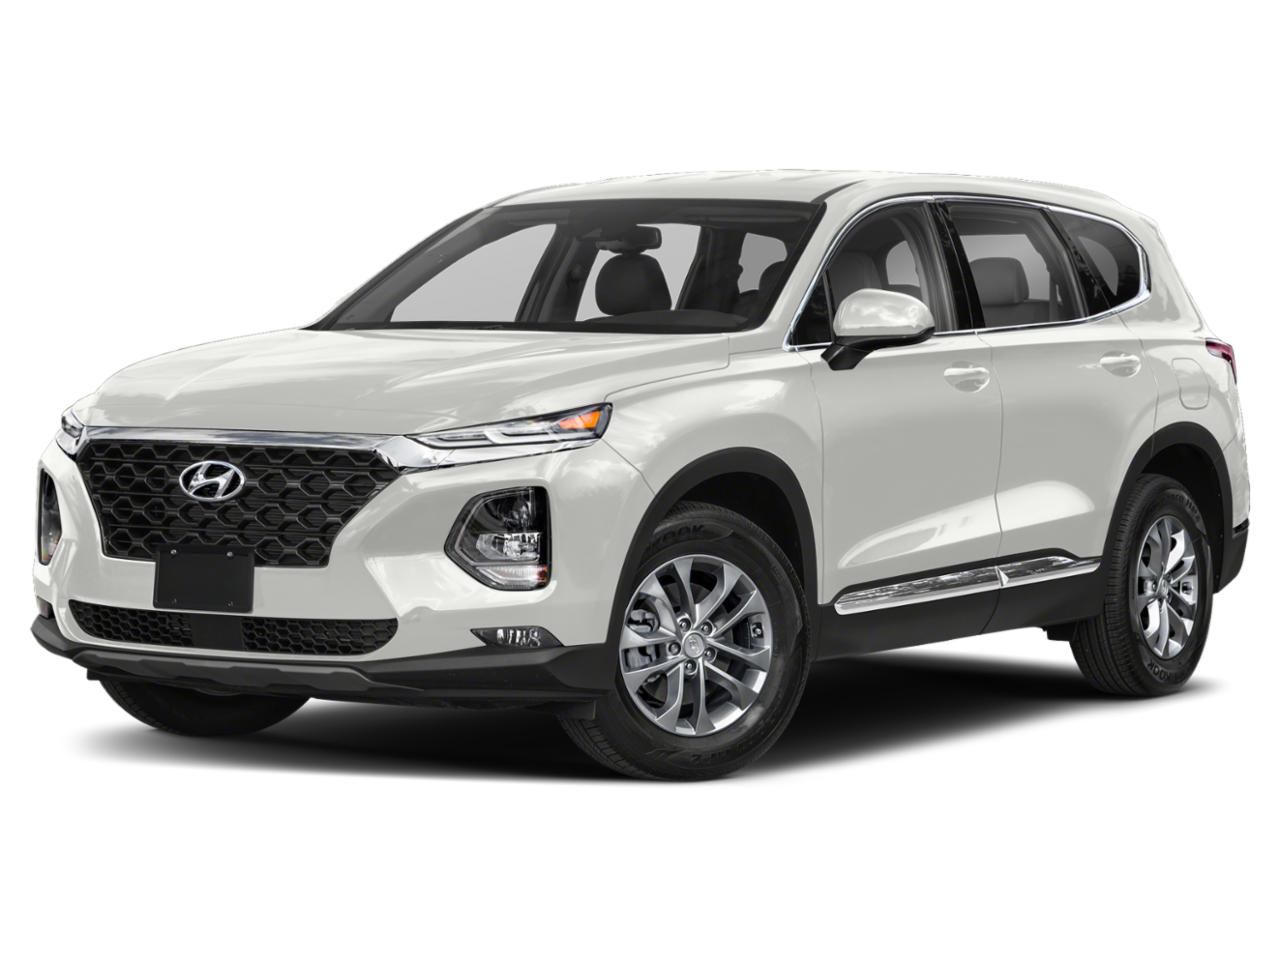 2019 Hyundai Santa Fe Vehicle Photo in Littleton, CO 80121